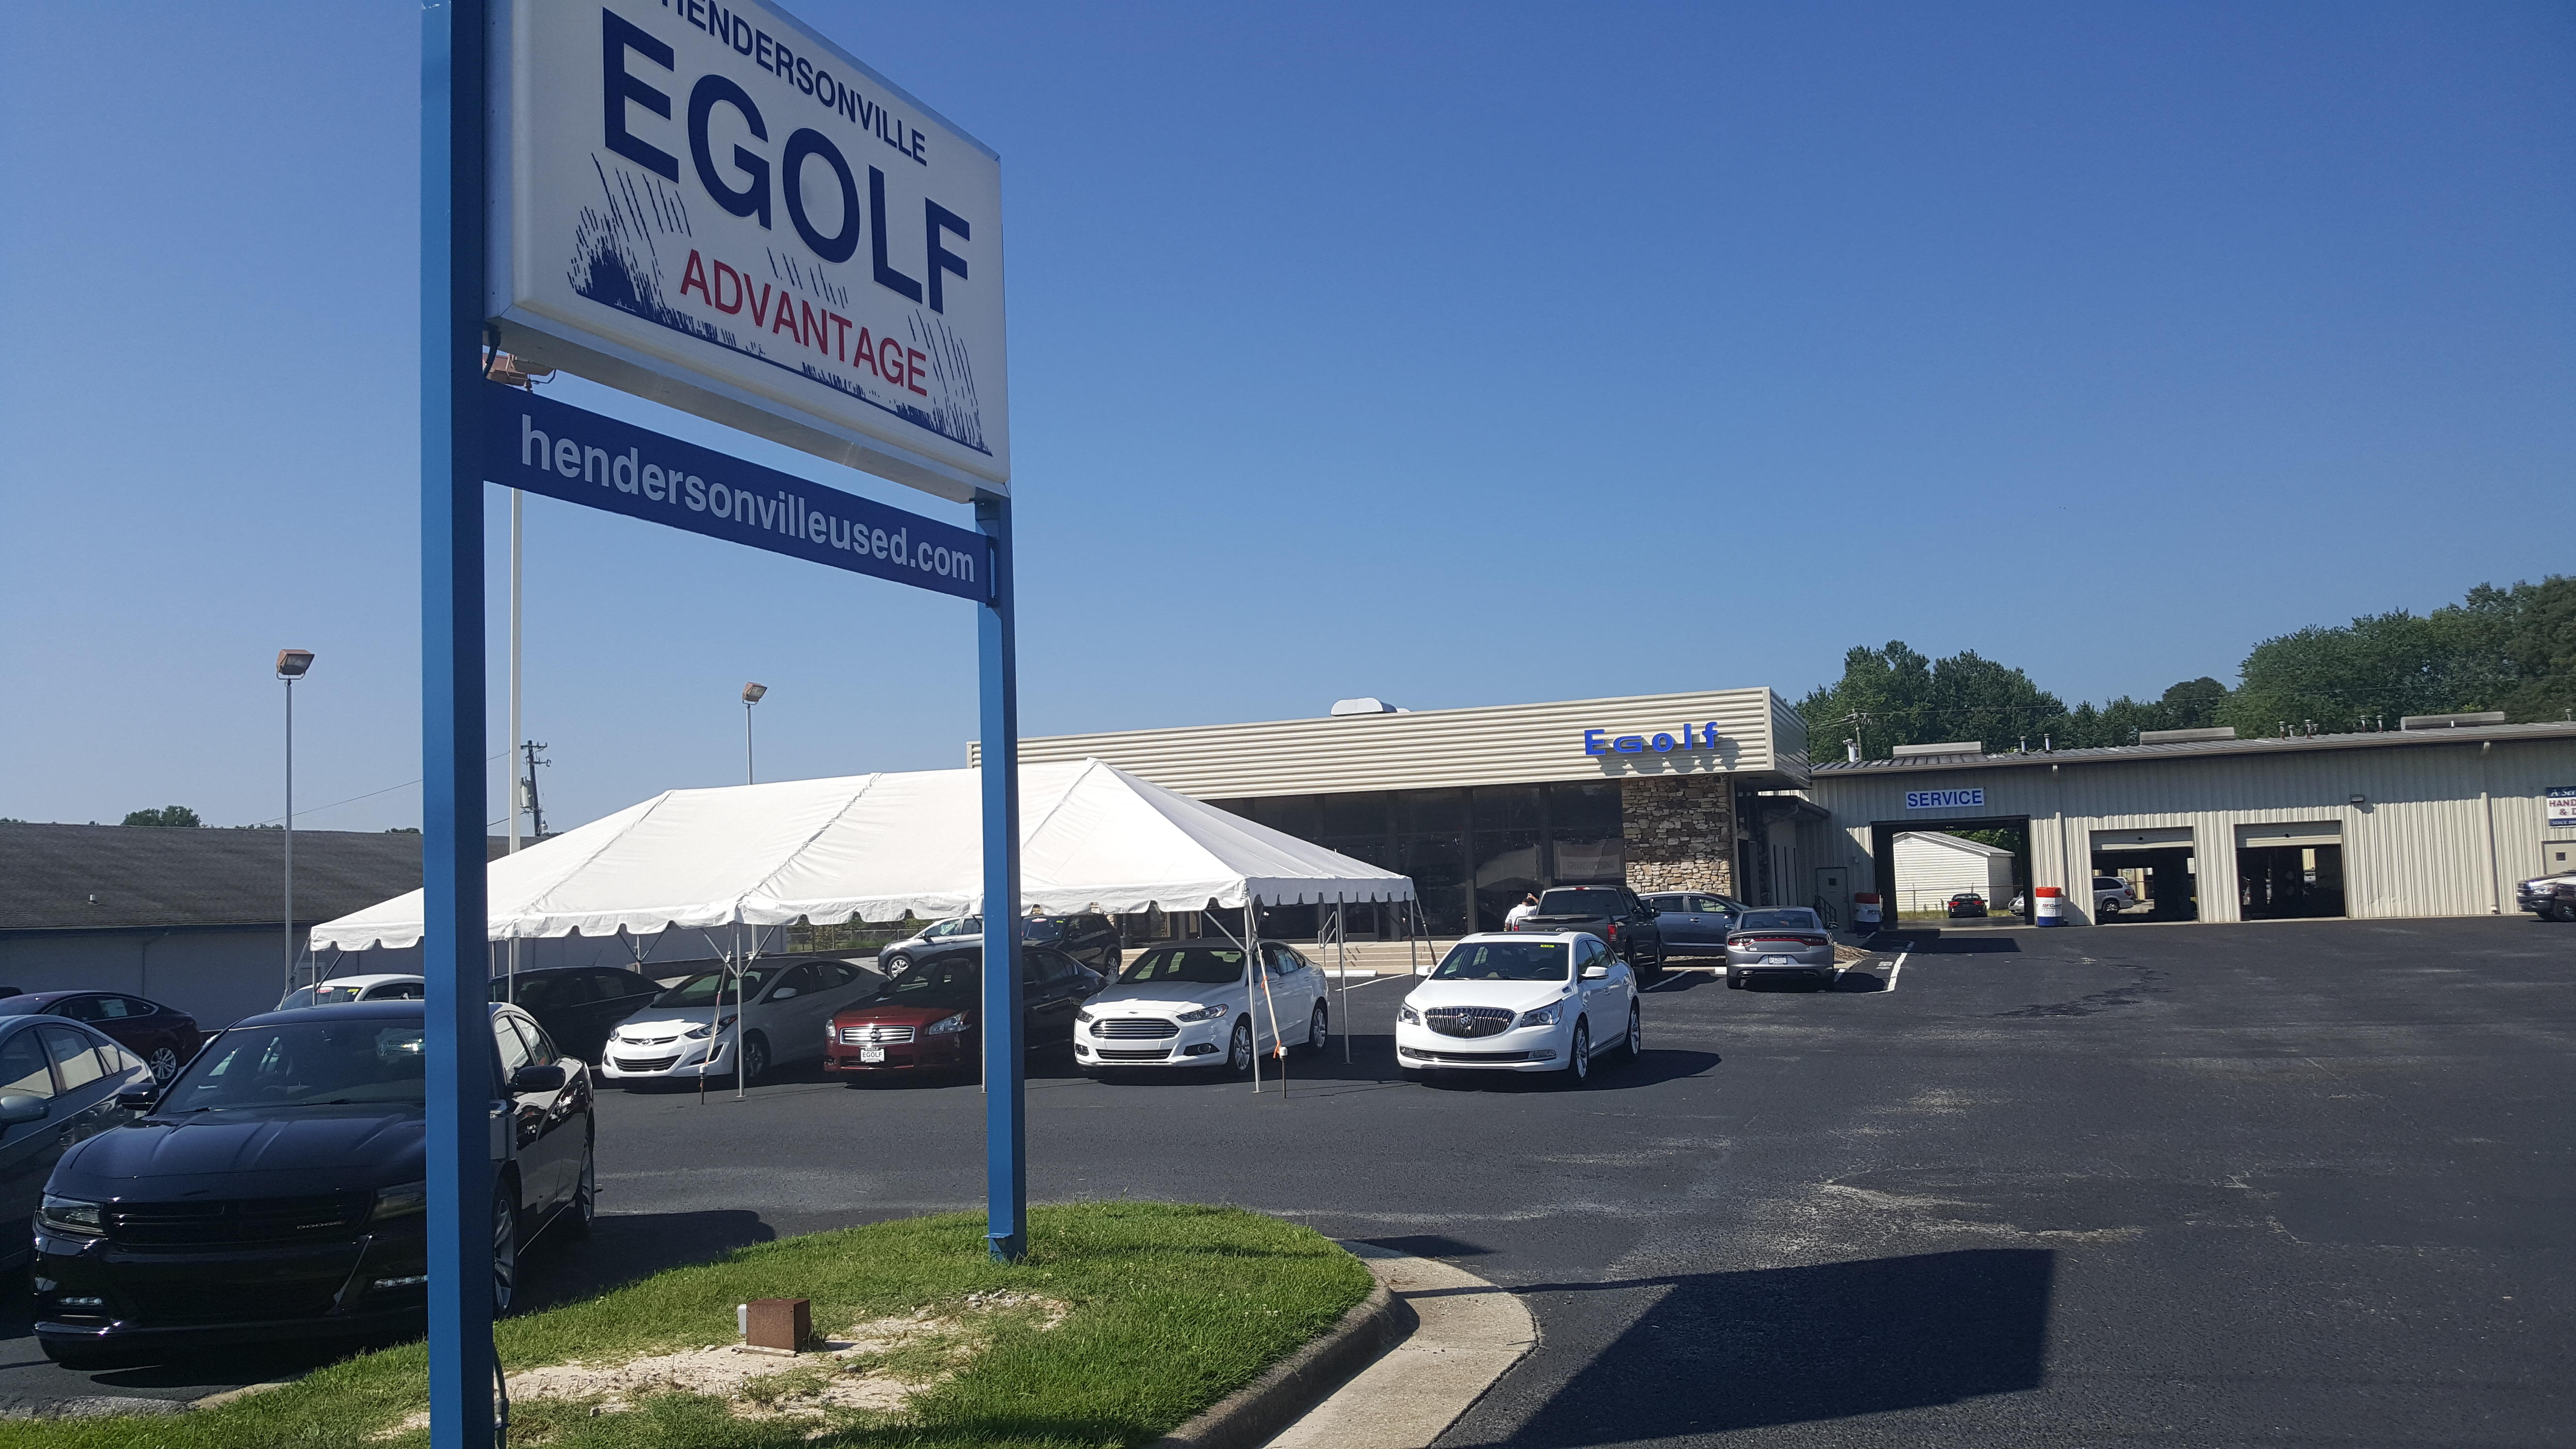 Egolf Hendersonville Used Cars Trucks And Service Hendersonville Nc